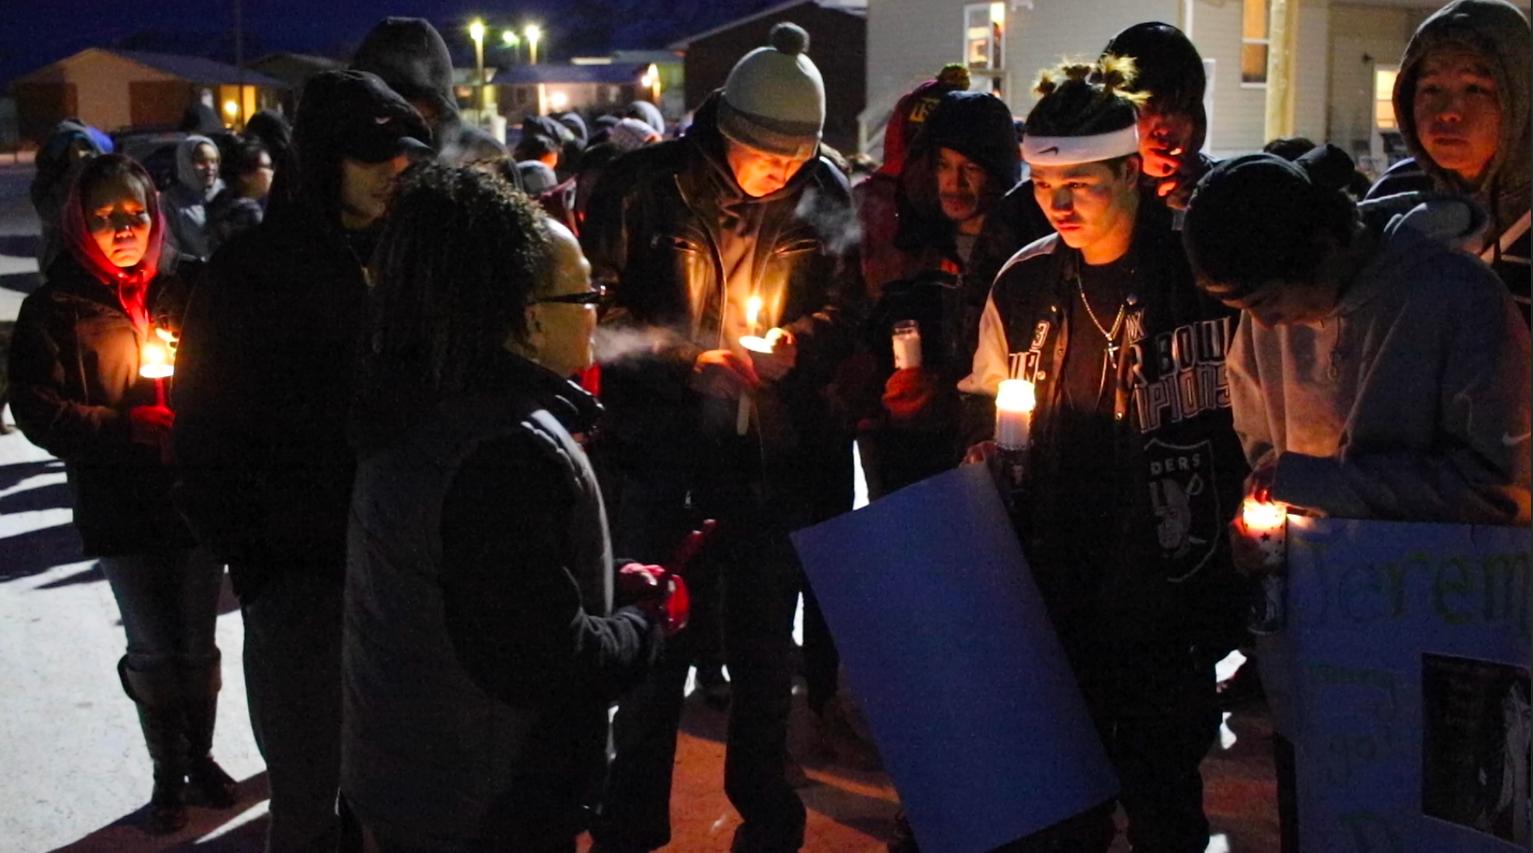 Candle light vigil 3.png